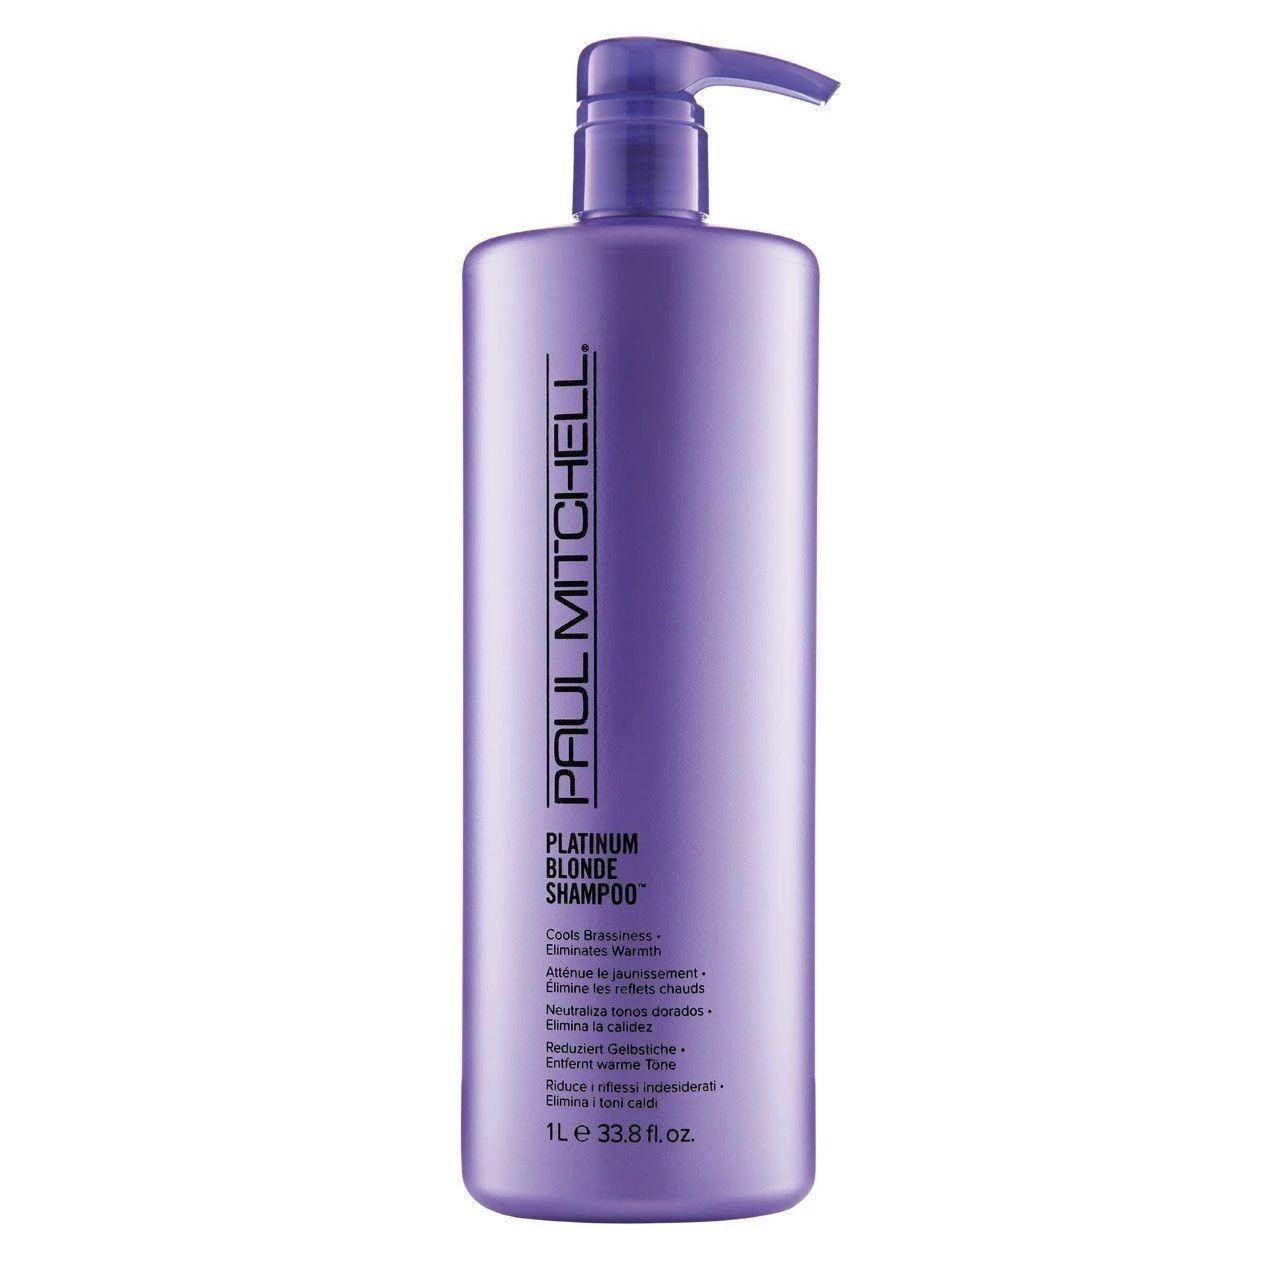 Paul Mitchell Platinum Blonde Shampoo - 1000ml